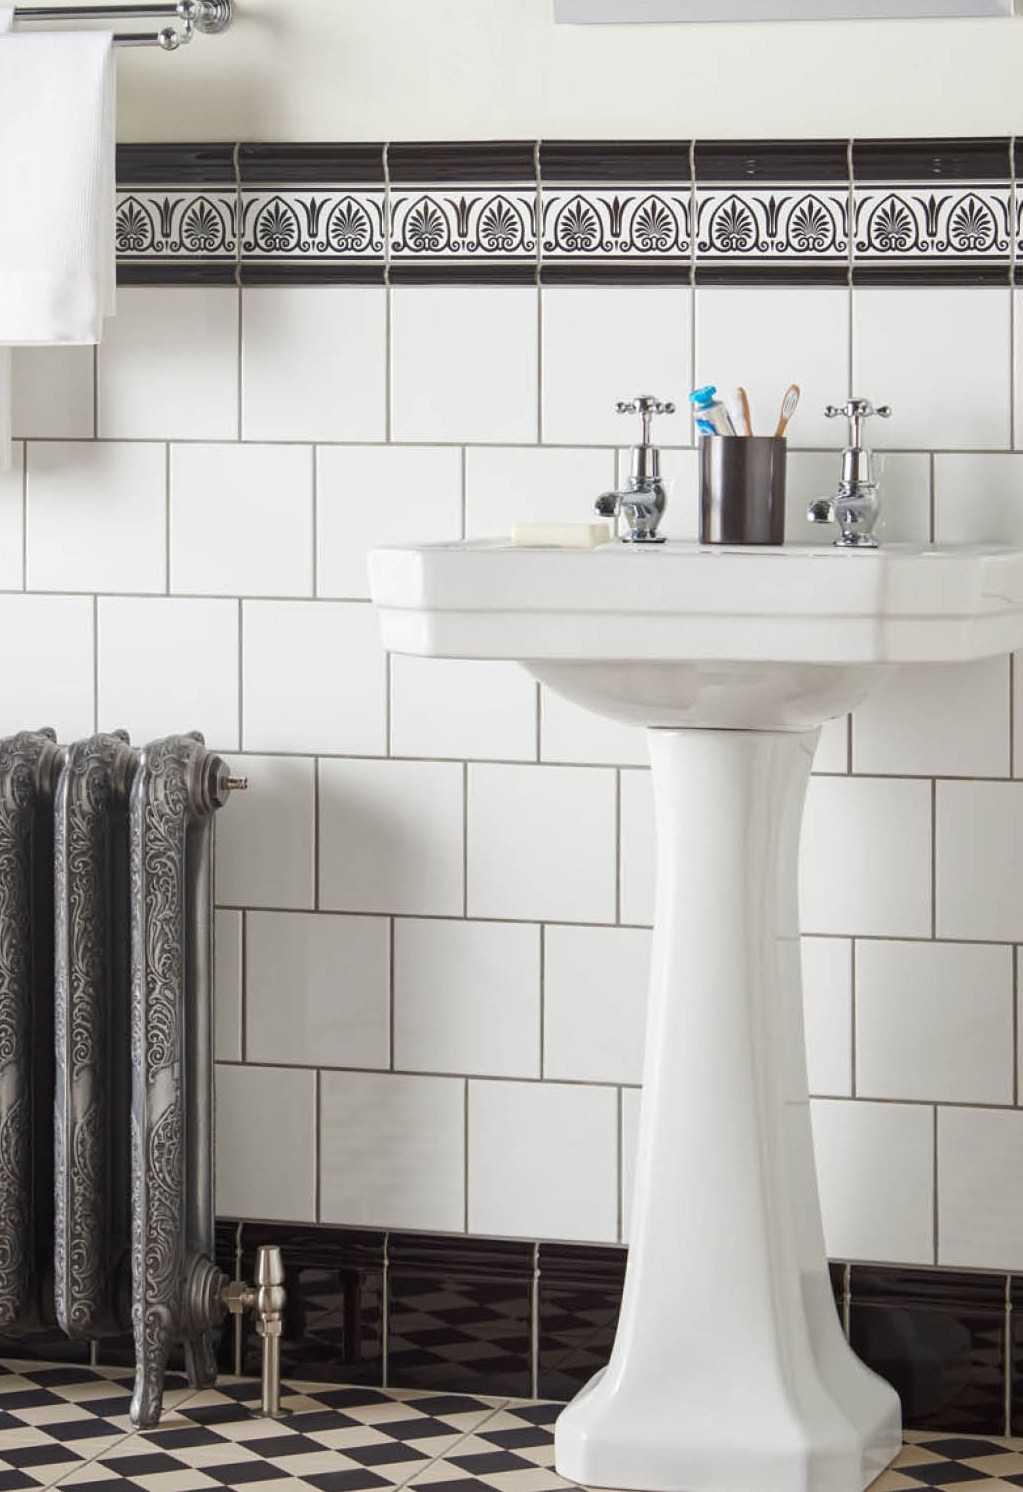 Decorative Tiles - Creeksidetile Ltd